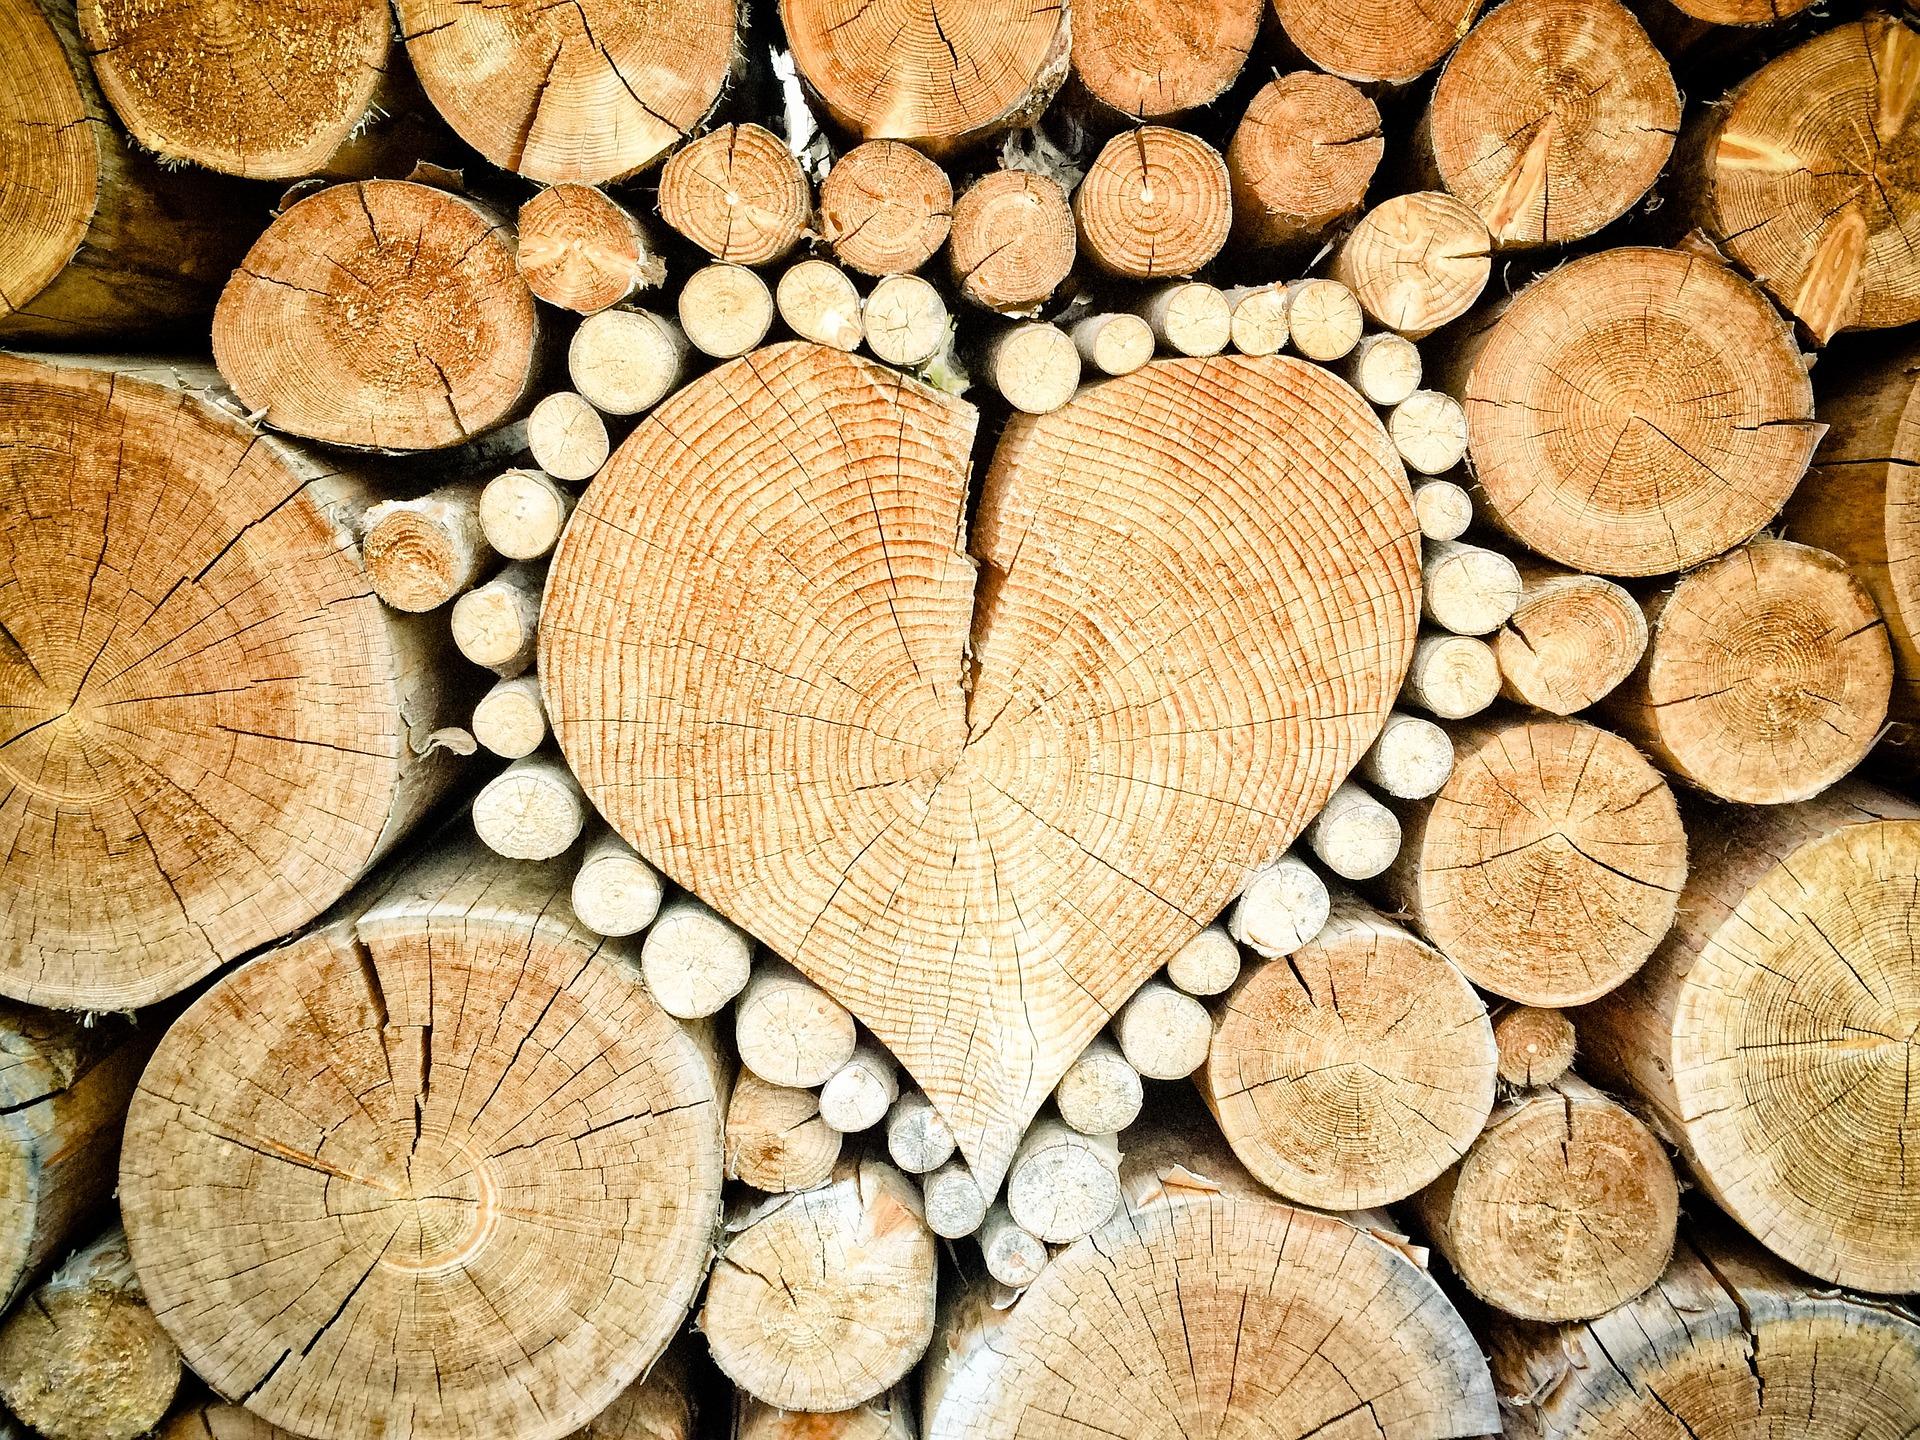 stadii ale intimitatii - sfatulparintilor.ro - pixabay_com - heart-1288420_1920